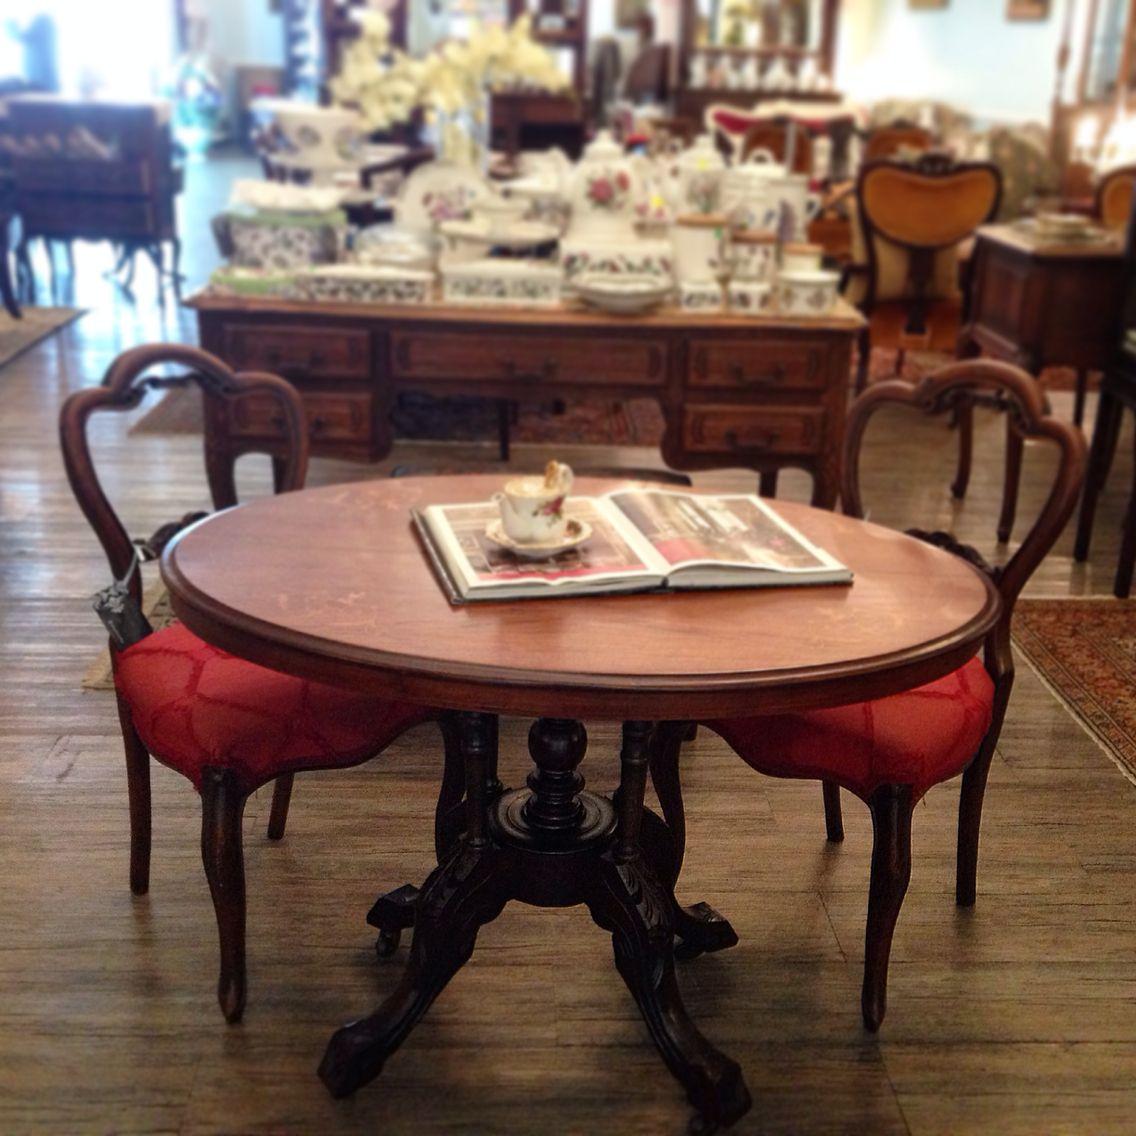 Victorian Antique Table Available Beautiful Chateau Publika Kuala Lumpur Malaysia Dining Table Decor Table